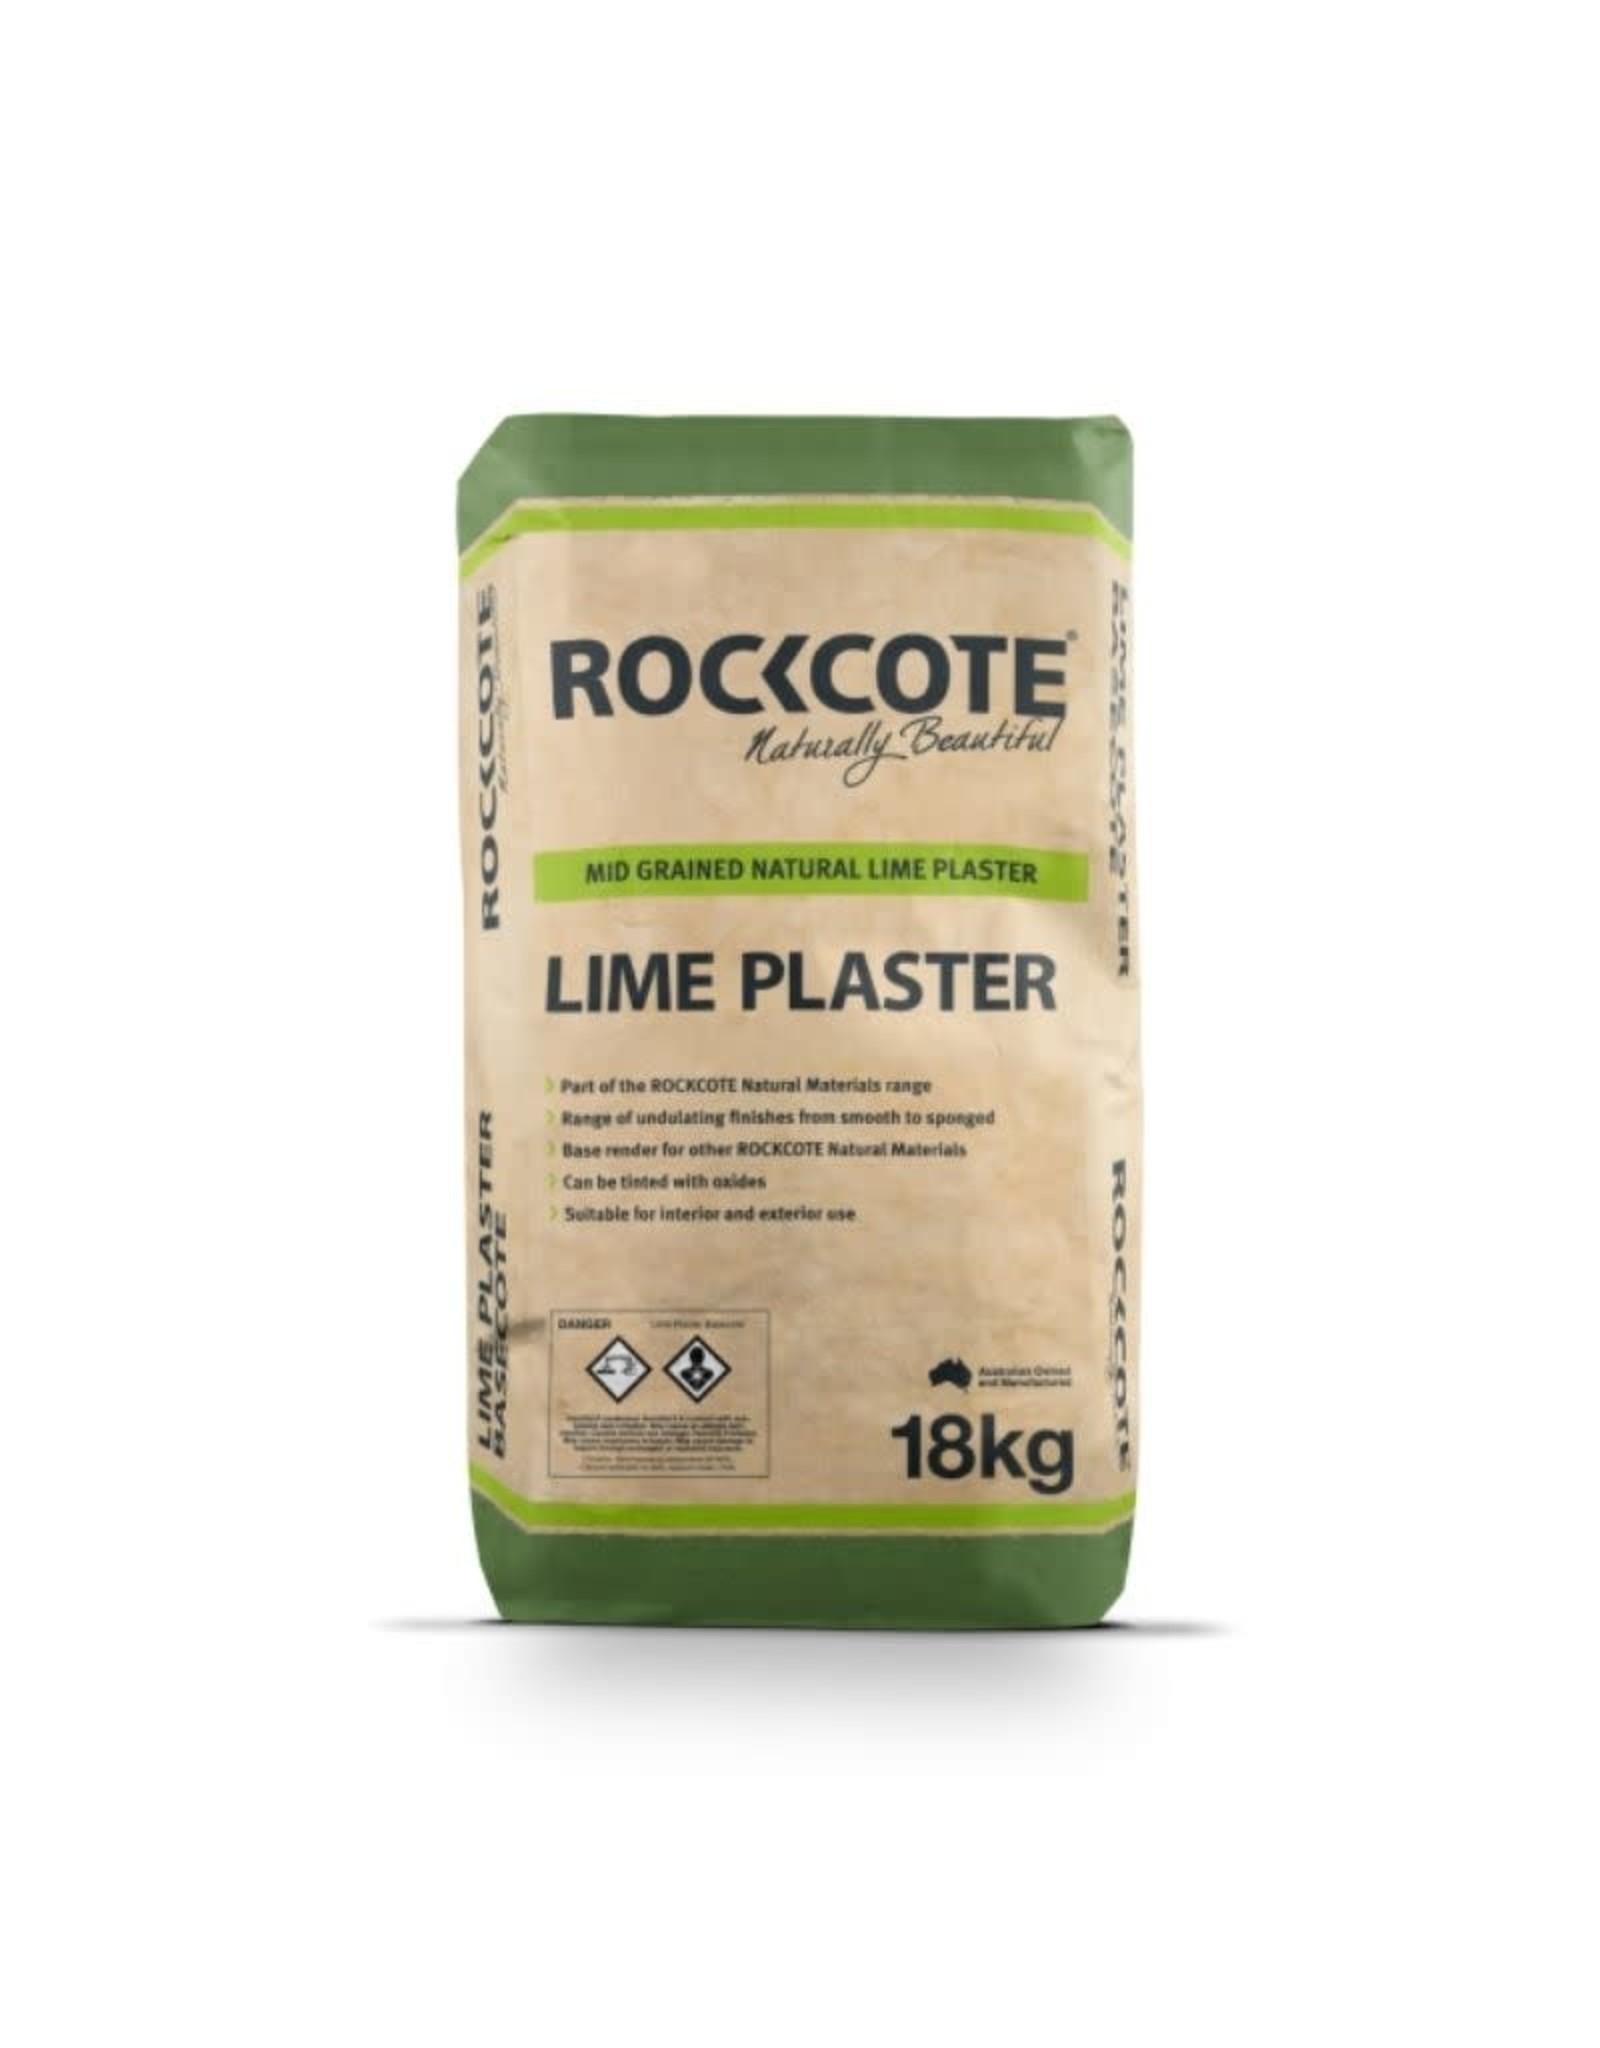 ROCKCOTE Lime Plaster